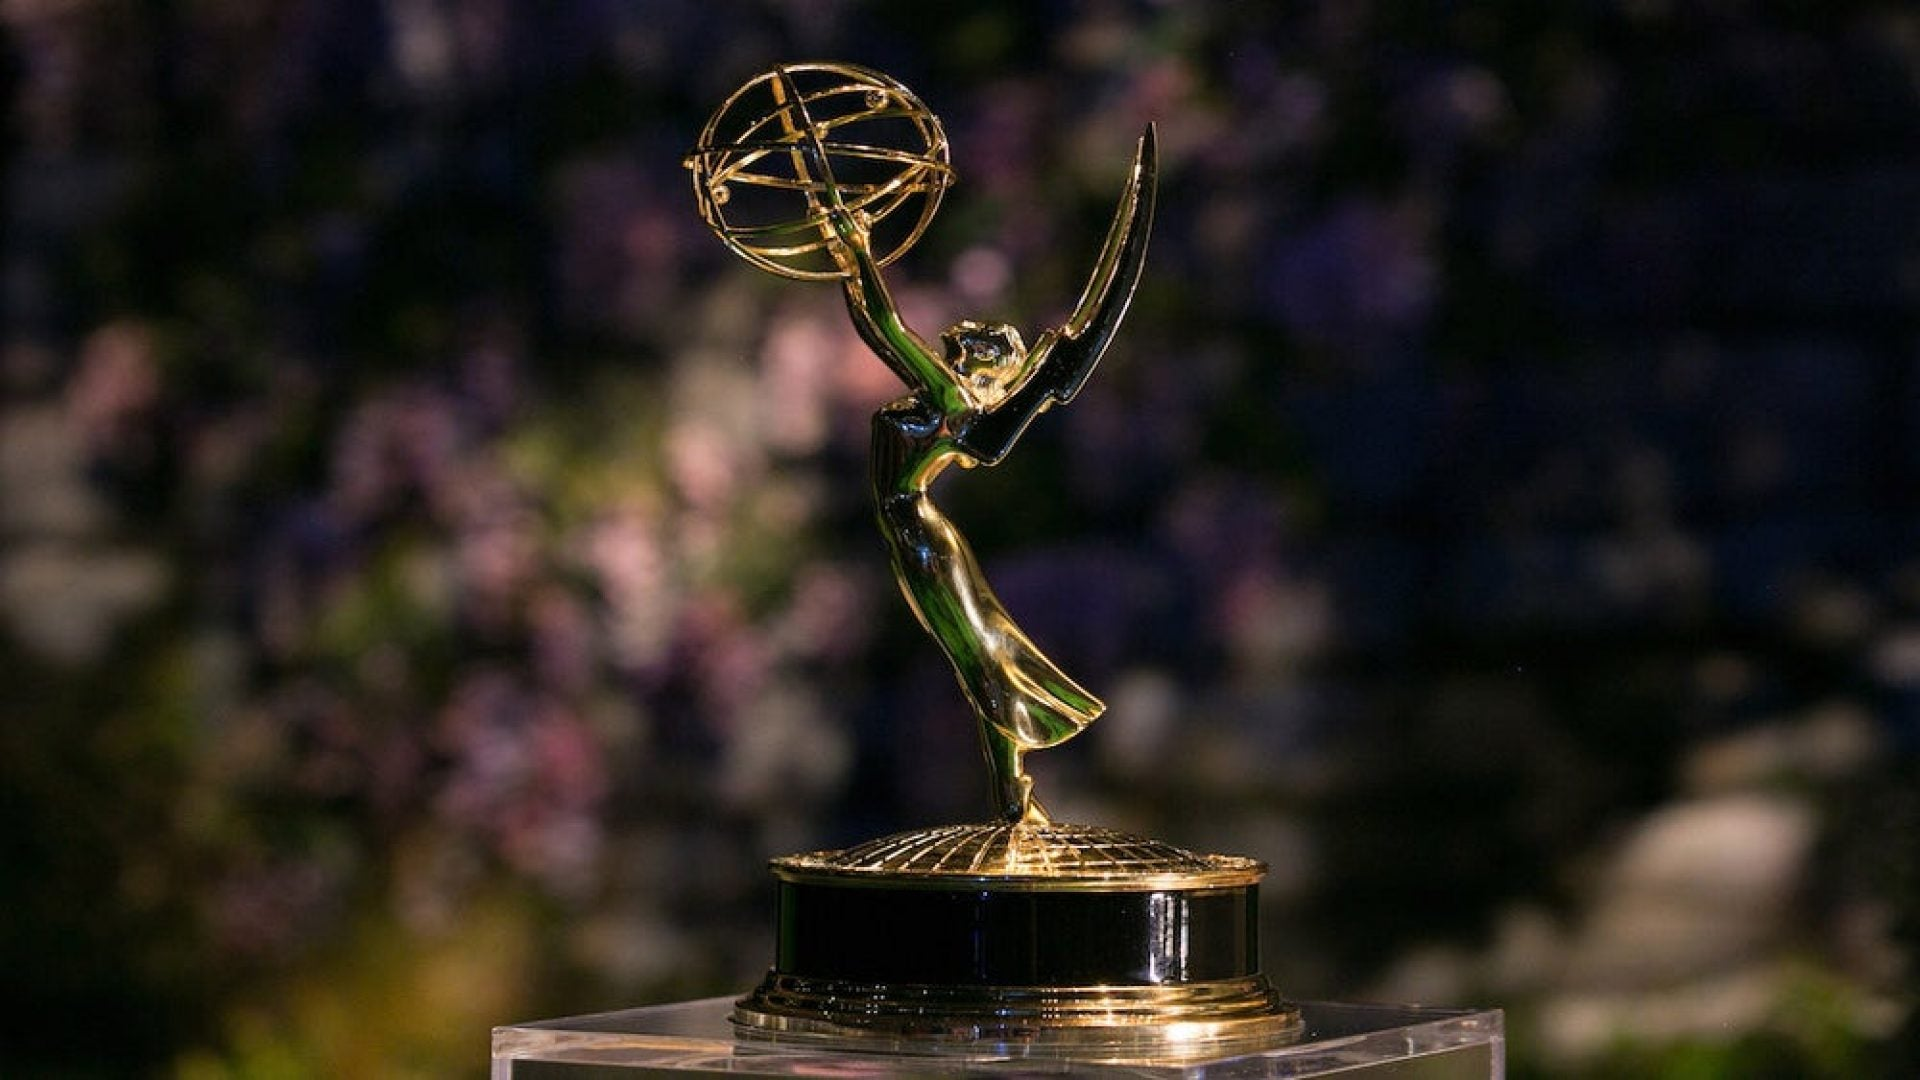 Emmy Awards To Go Virtual Amid COVID-19